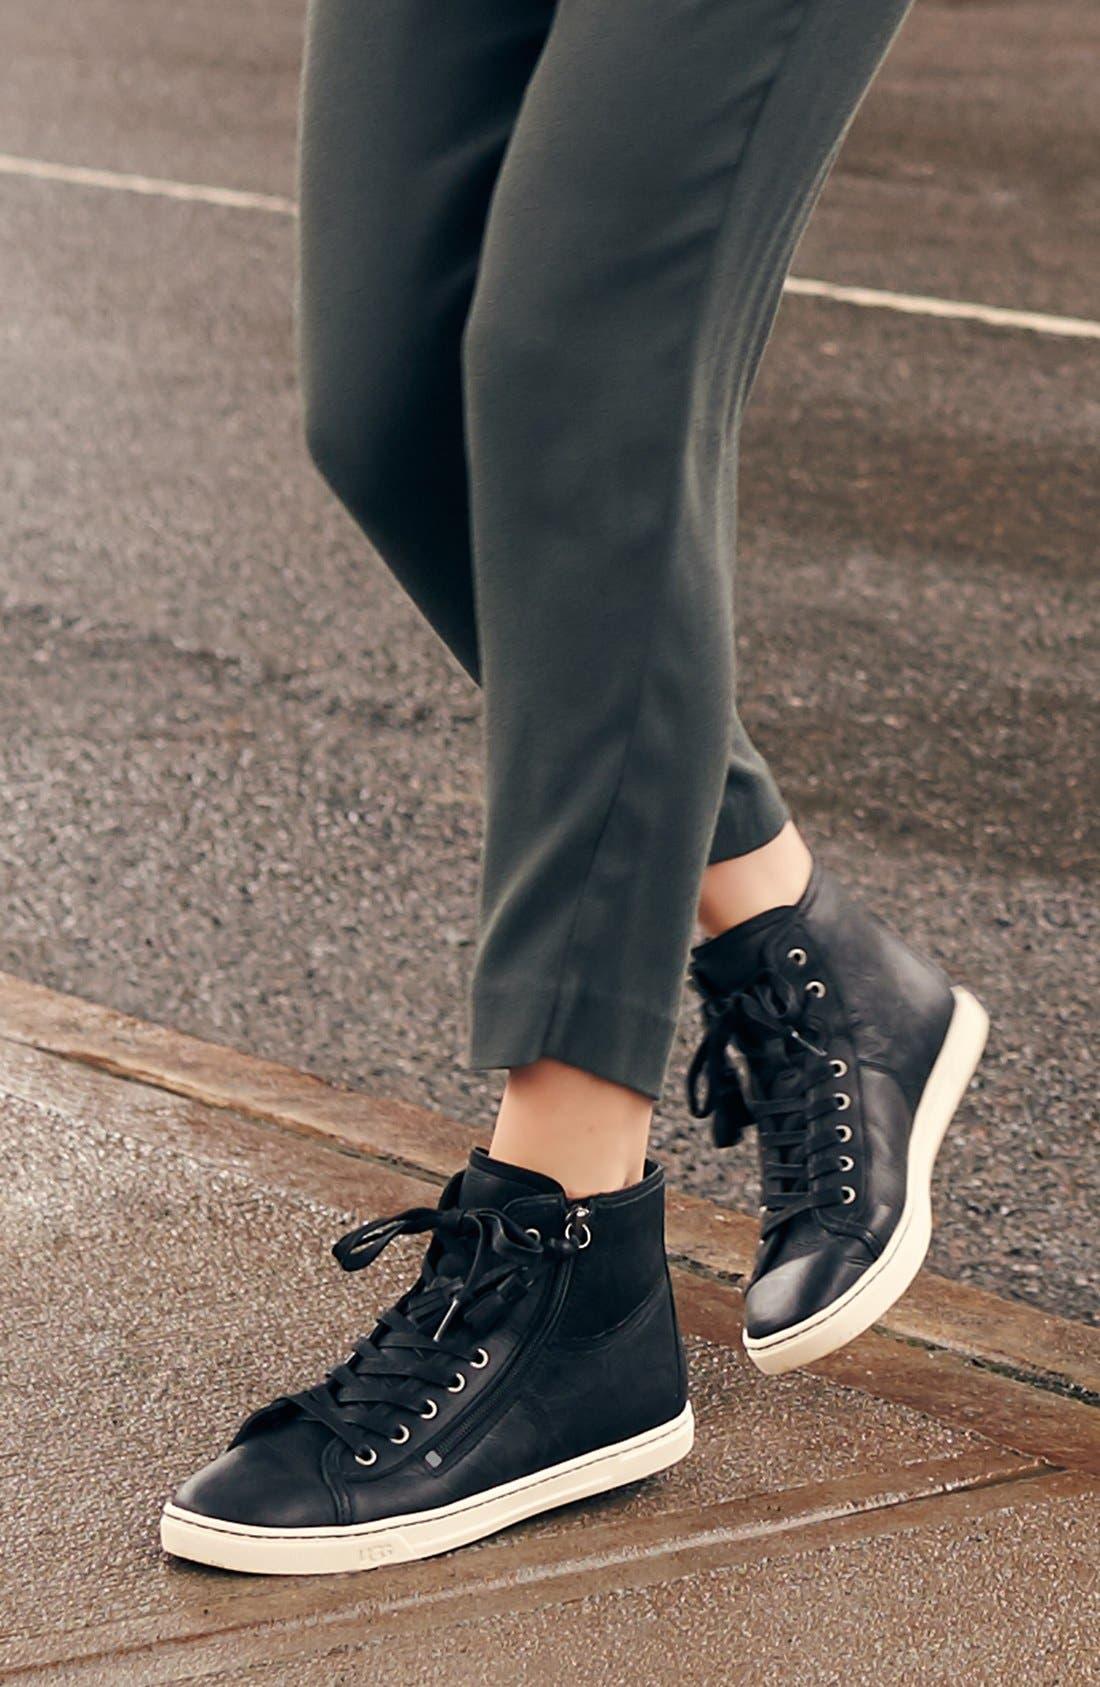 UGG<SUP>®</SUP>, 'Blaney' Tasseled High Top Sneaker, Main thumbnail 1, color, 001